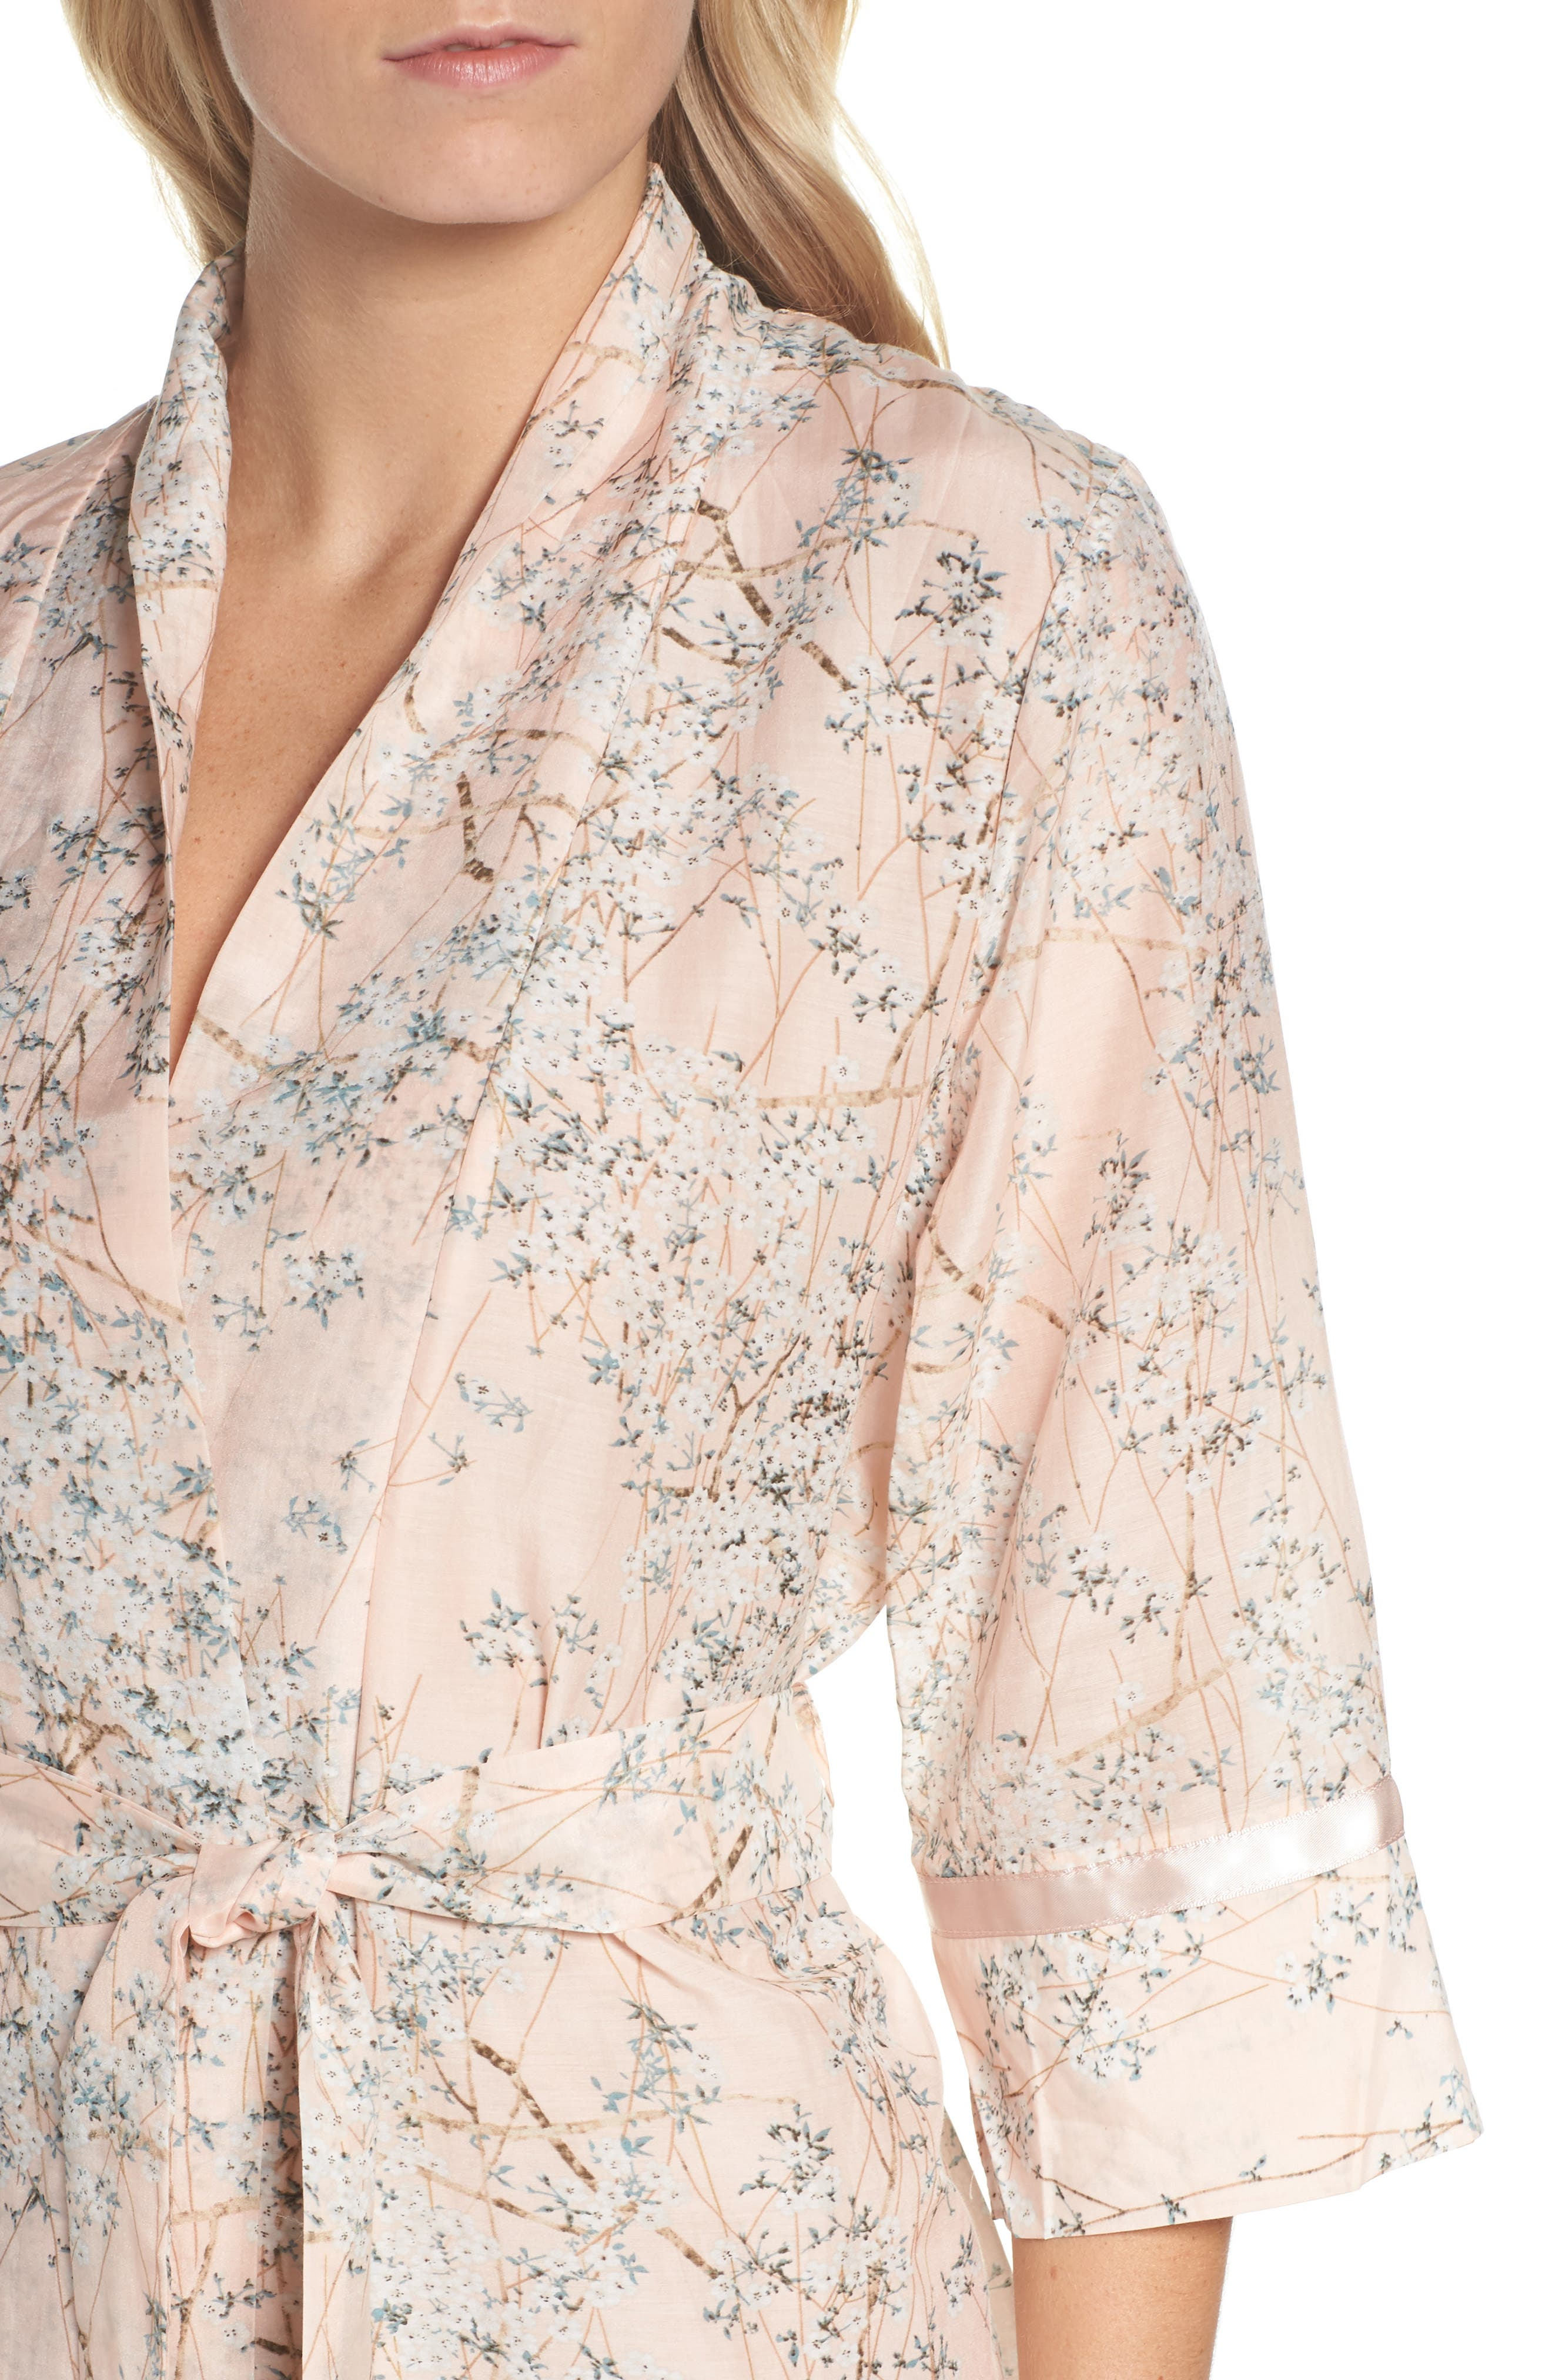 PAPINELLE,                             Cherry Blossom Cotton & Silk Short Robe,                             Alternate thumbnail 4, color,                             950